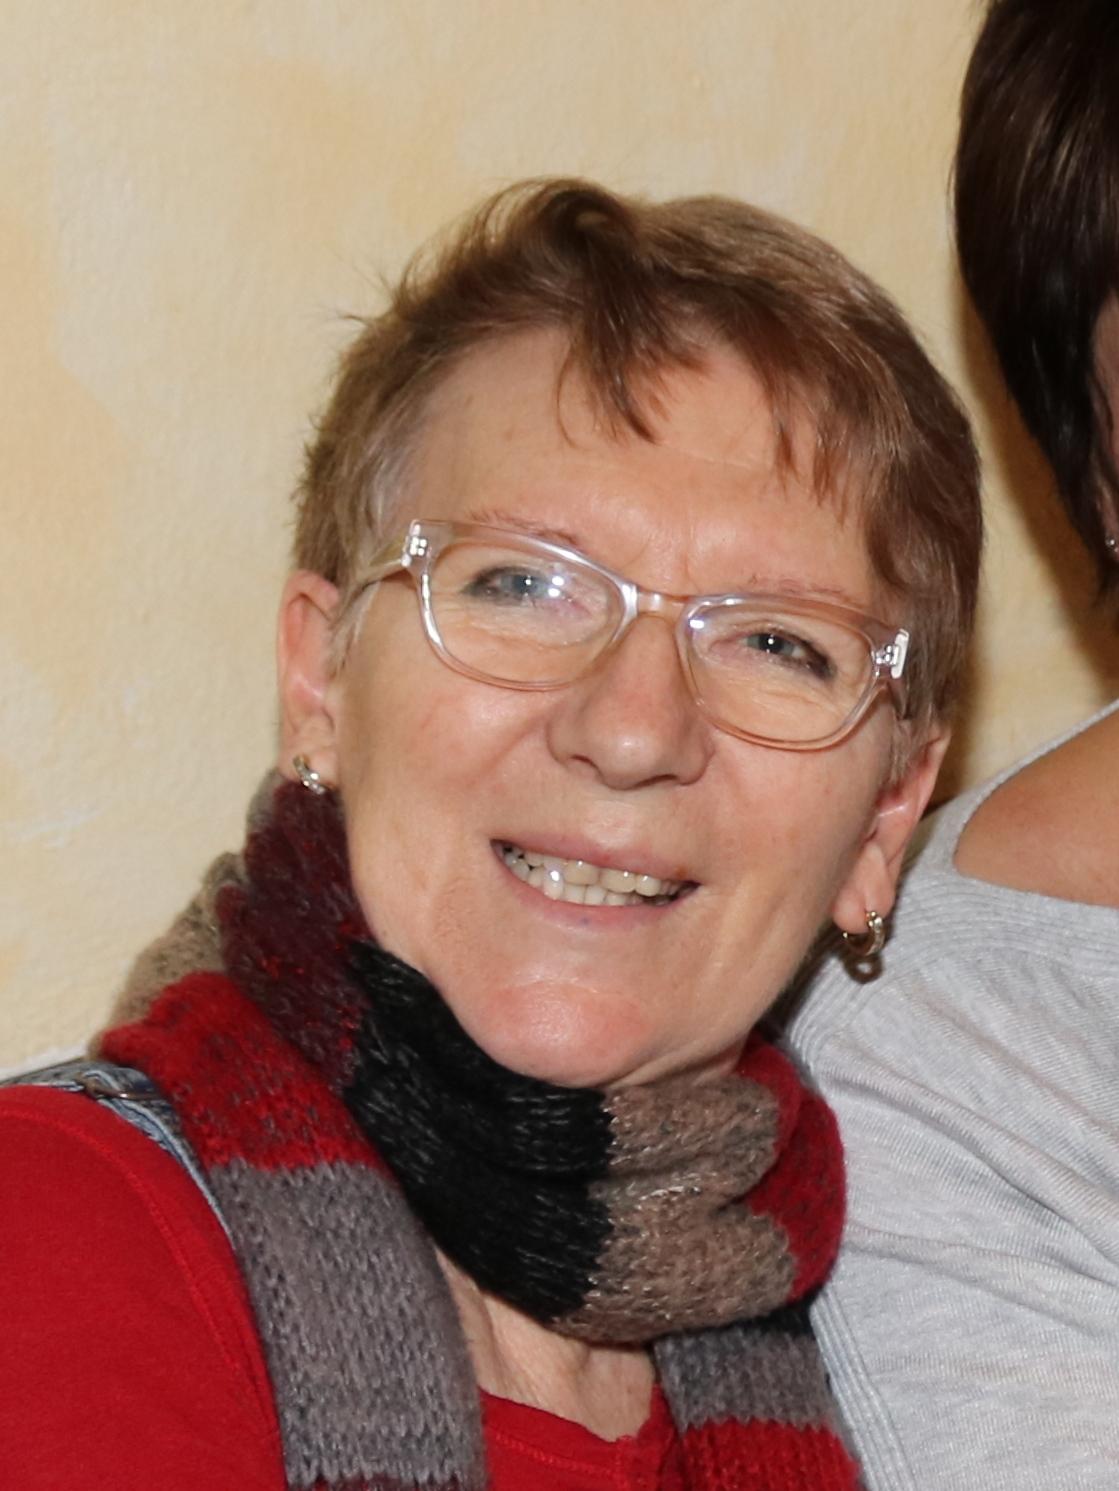 Vroni - Maria Wokatsch